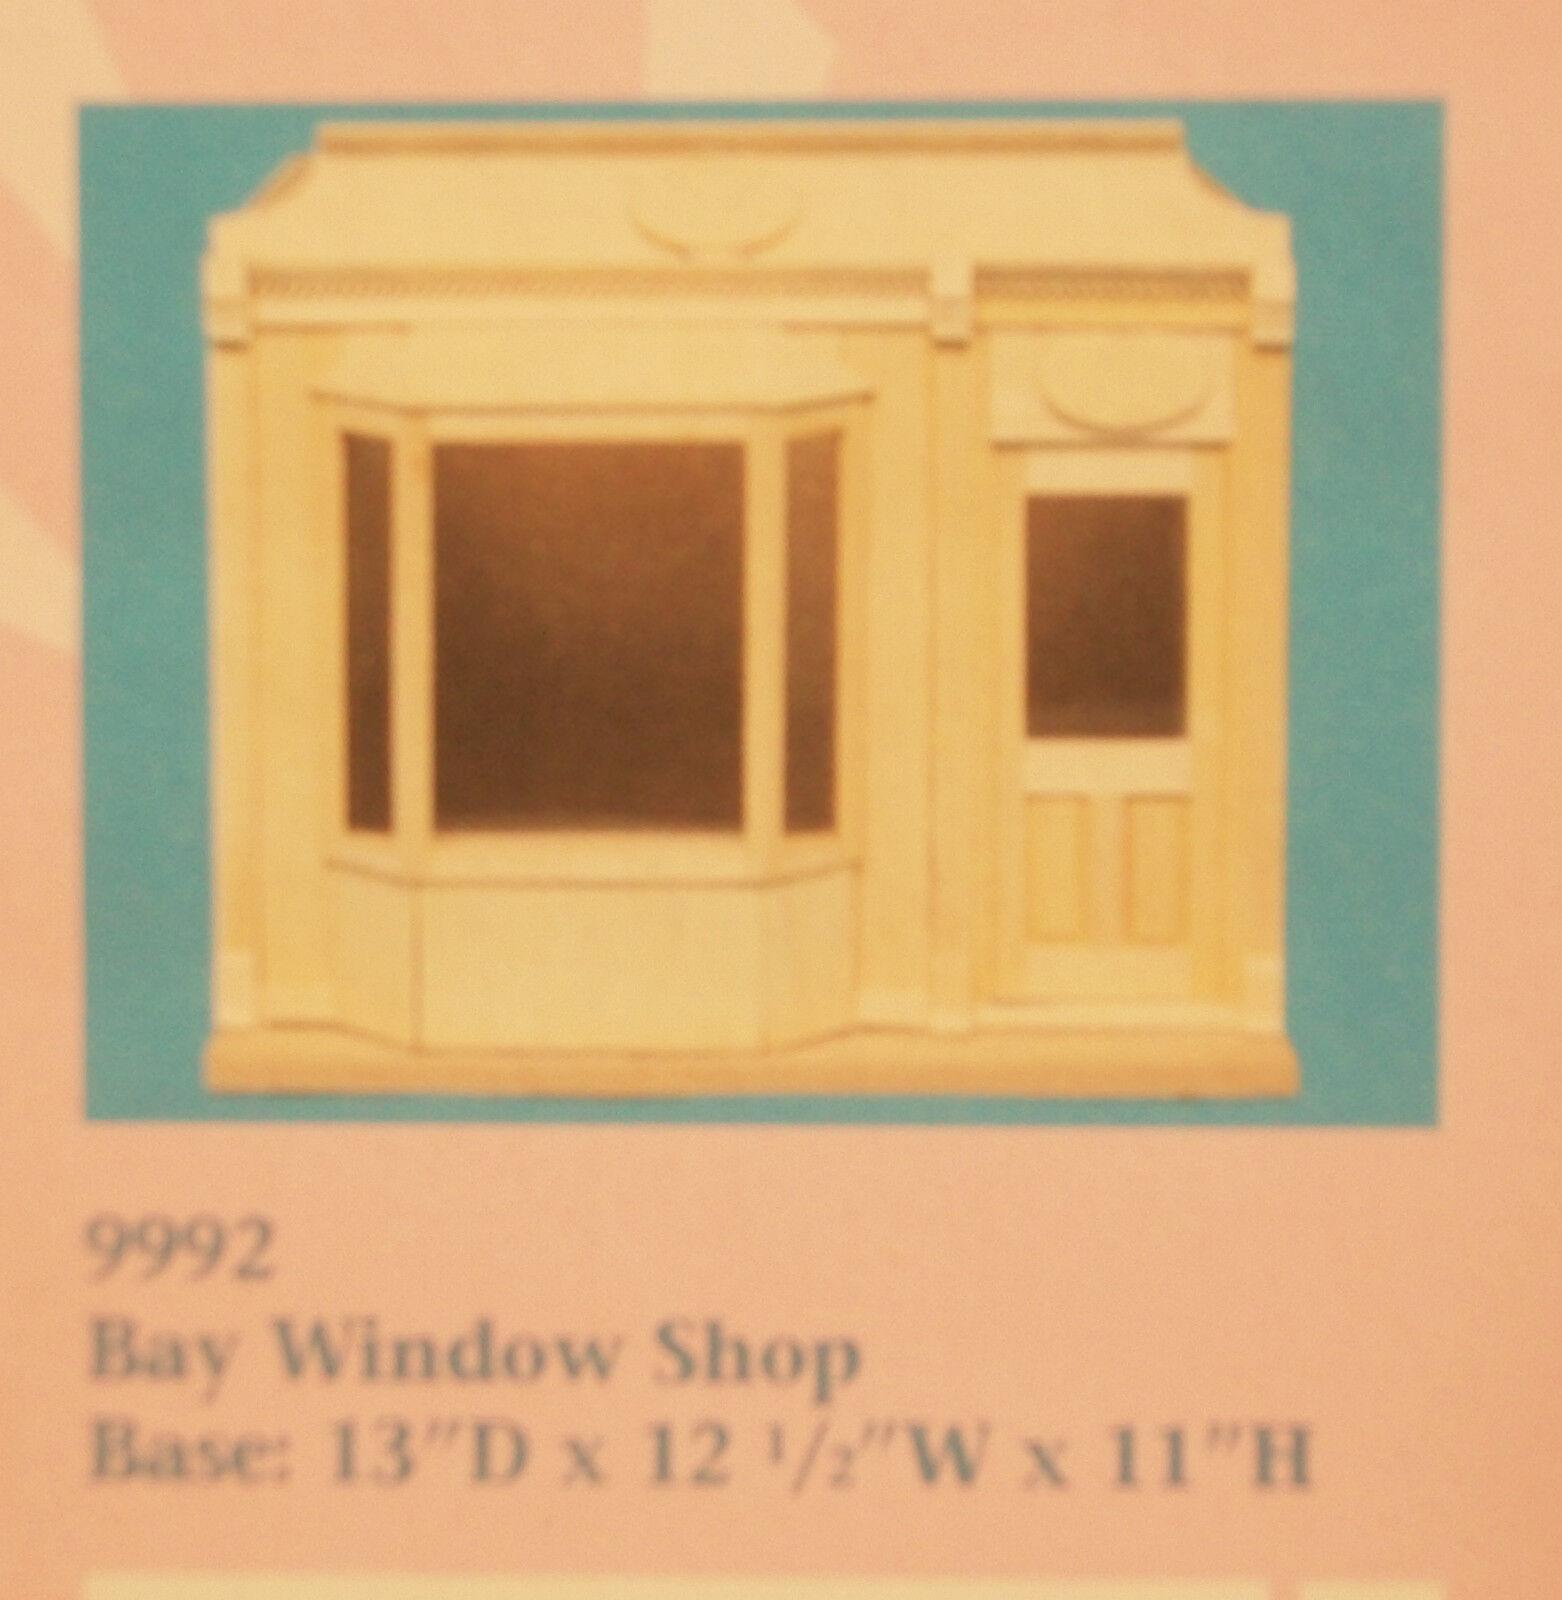 Erkerfenster Laden Kit Houseworks 9992 Unvollendet Holz 1 12 Maßstab Puppenhaus